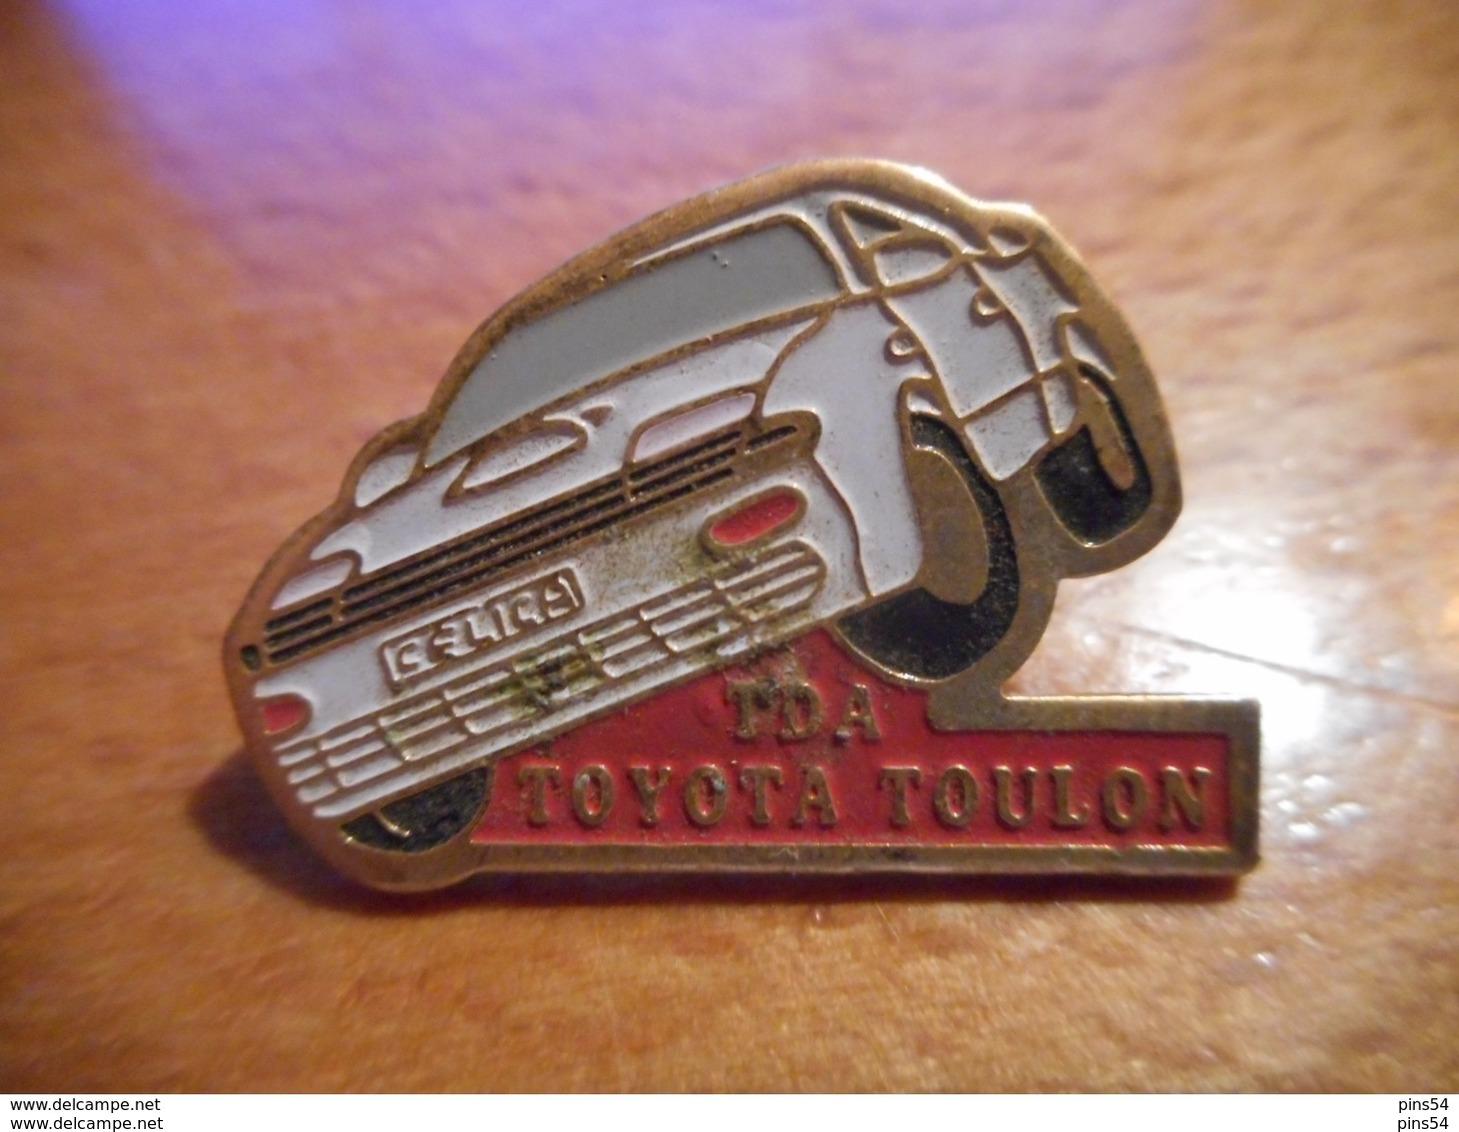 A018 -- Pin's Toyota Toulon - Toyota